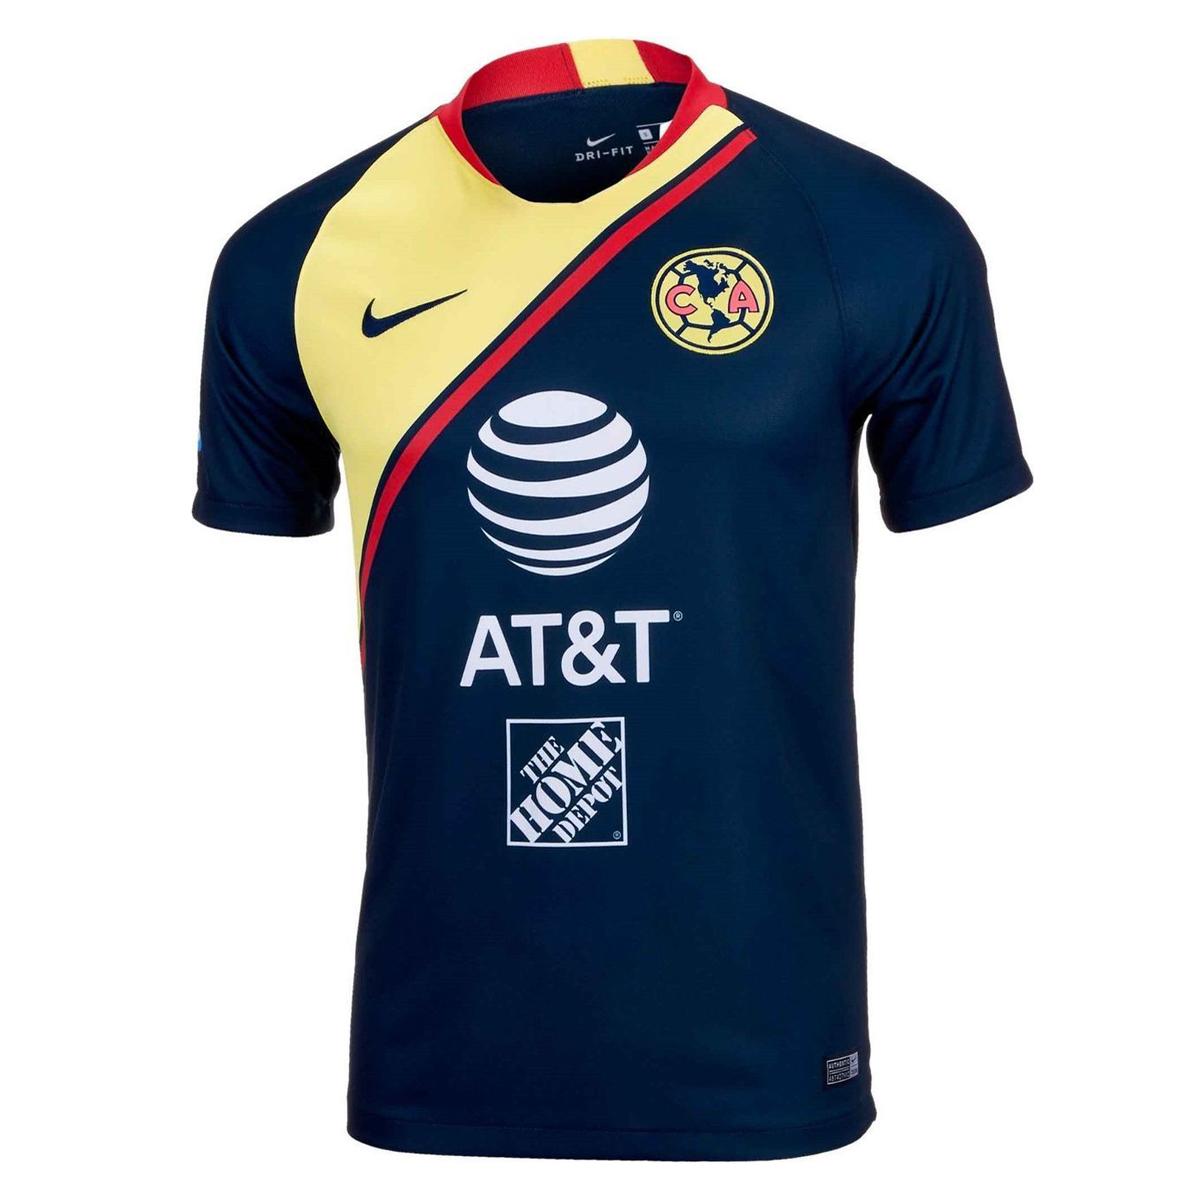 36b603a44 Club America 2018 19 Away Shirt Soccer Jersey